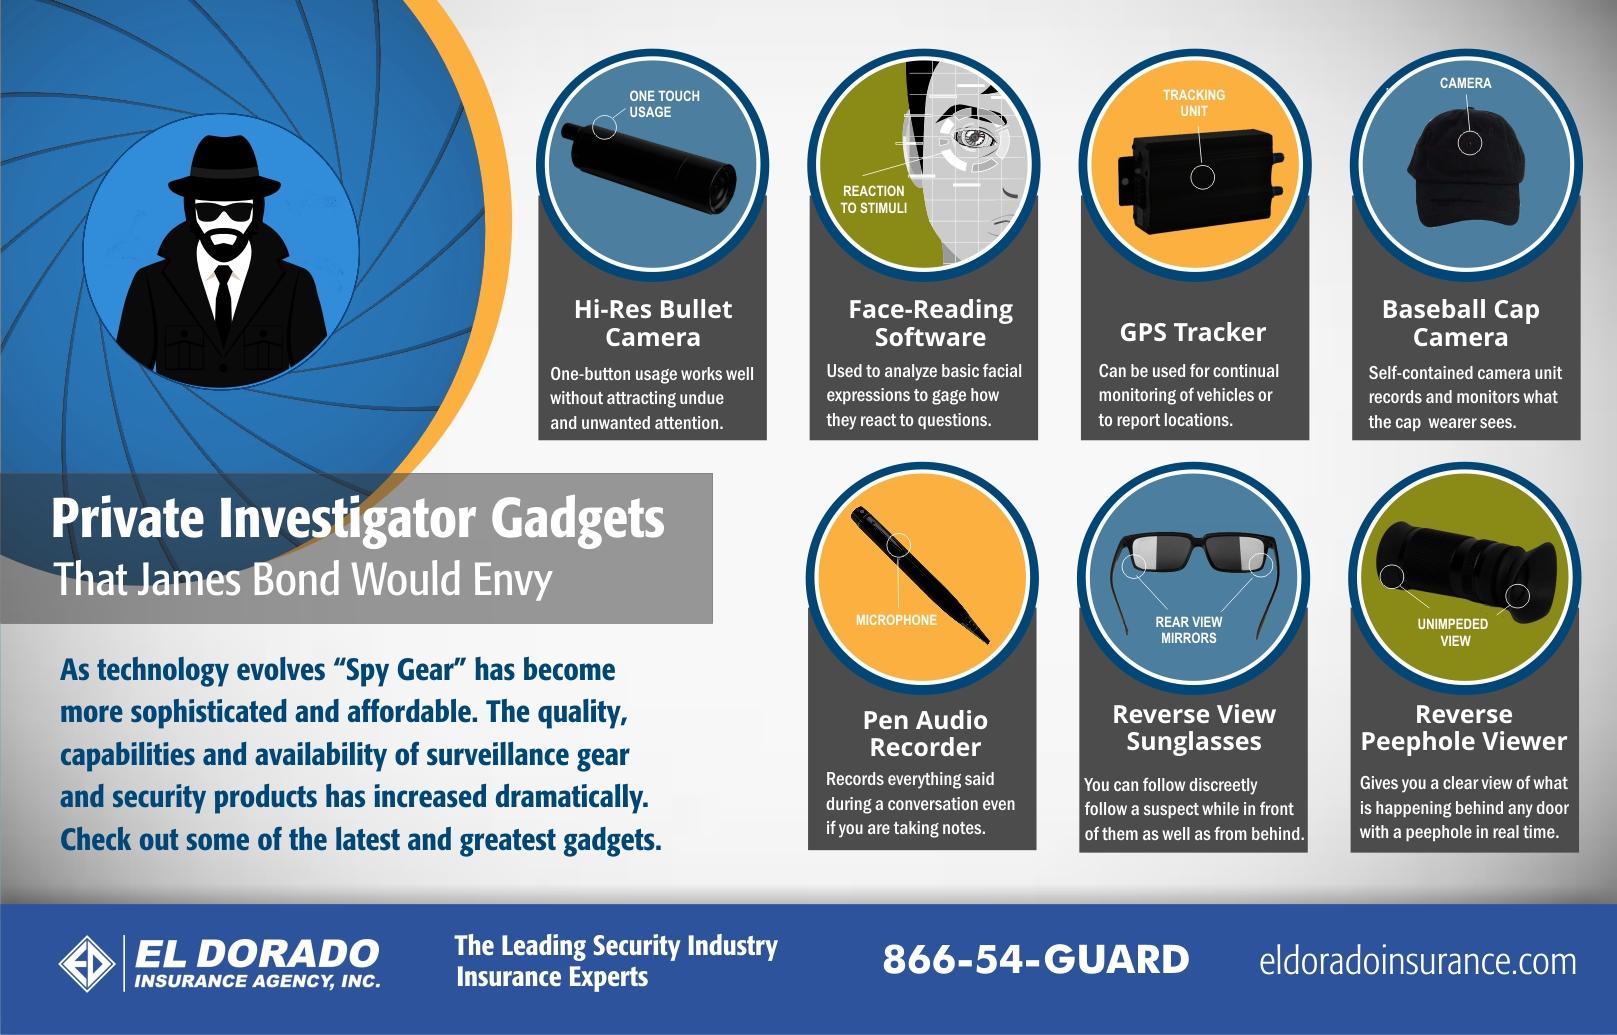 ED_infographic_7_bond_gadgets